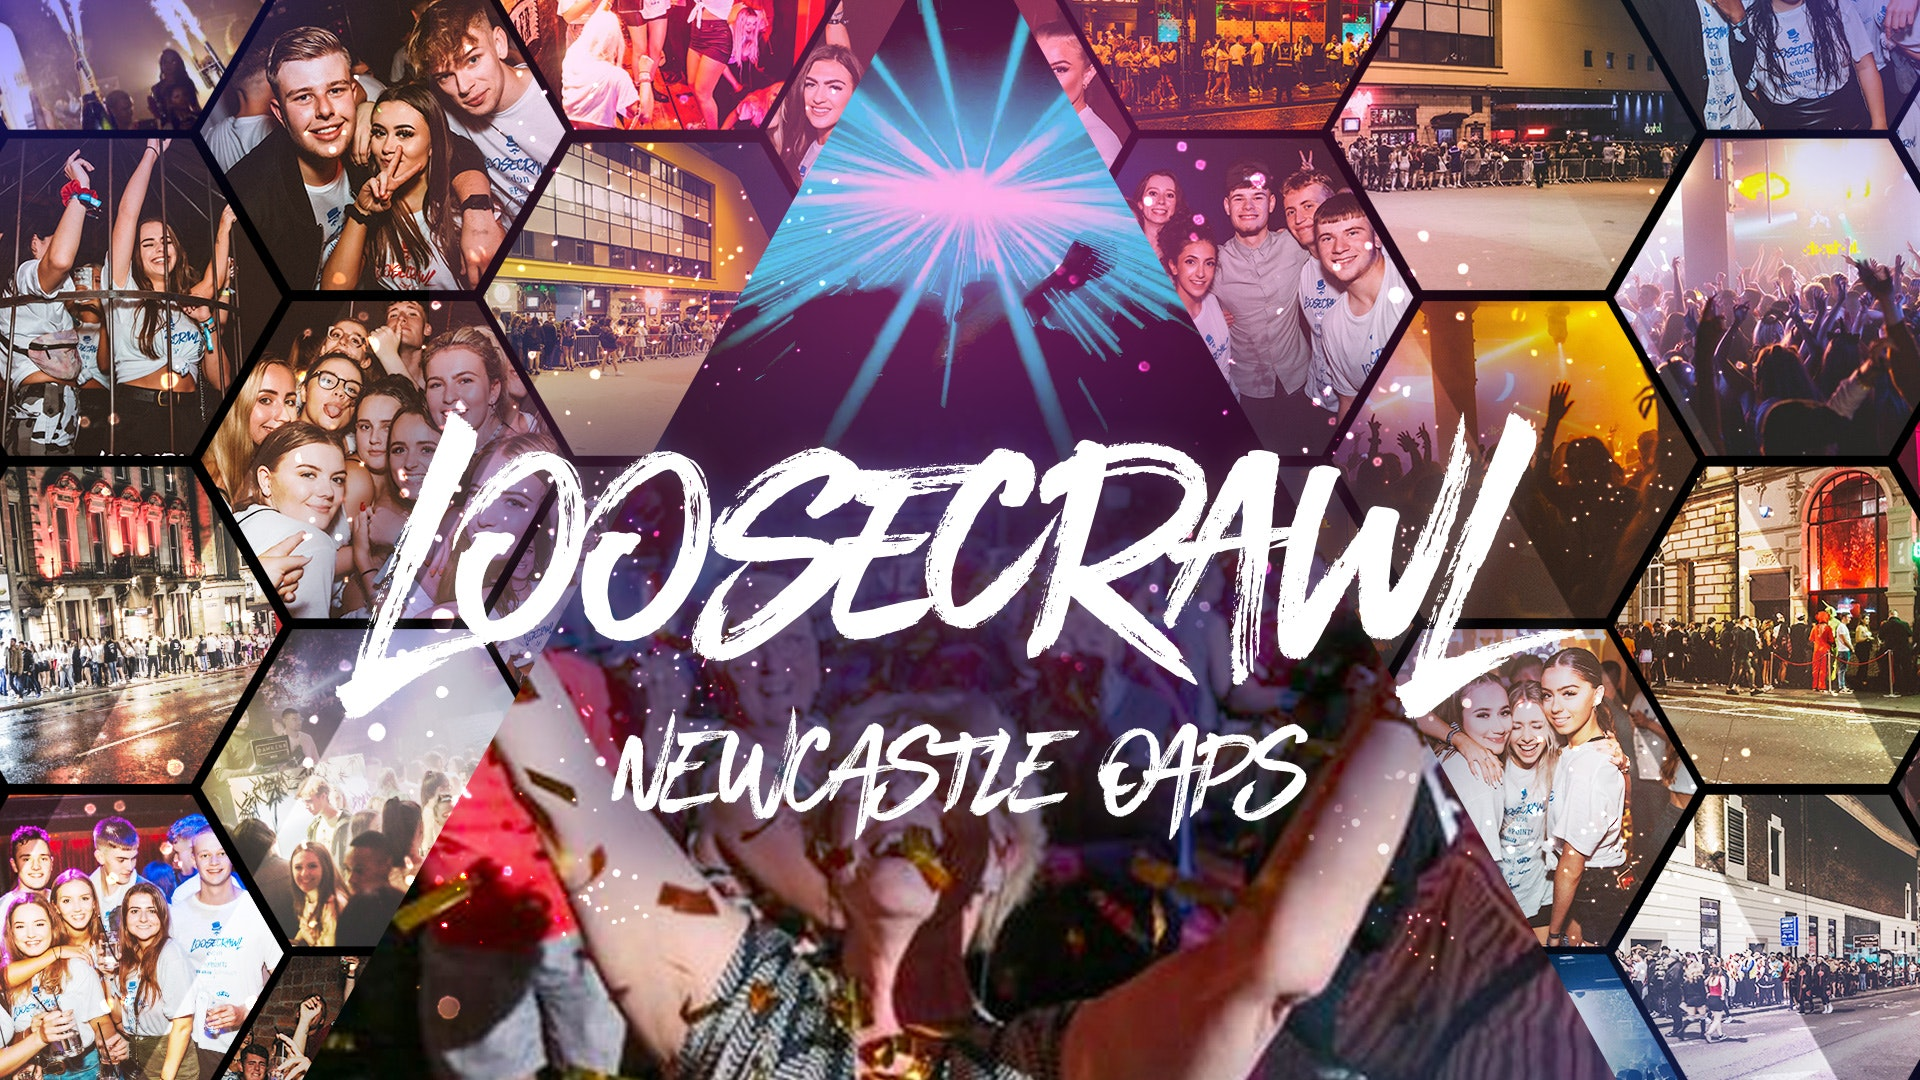 THE OAP LOOSECRAWL 👵🏼   NEWCASTLE UNIVERSITY